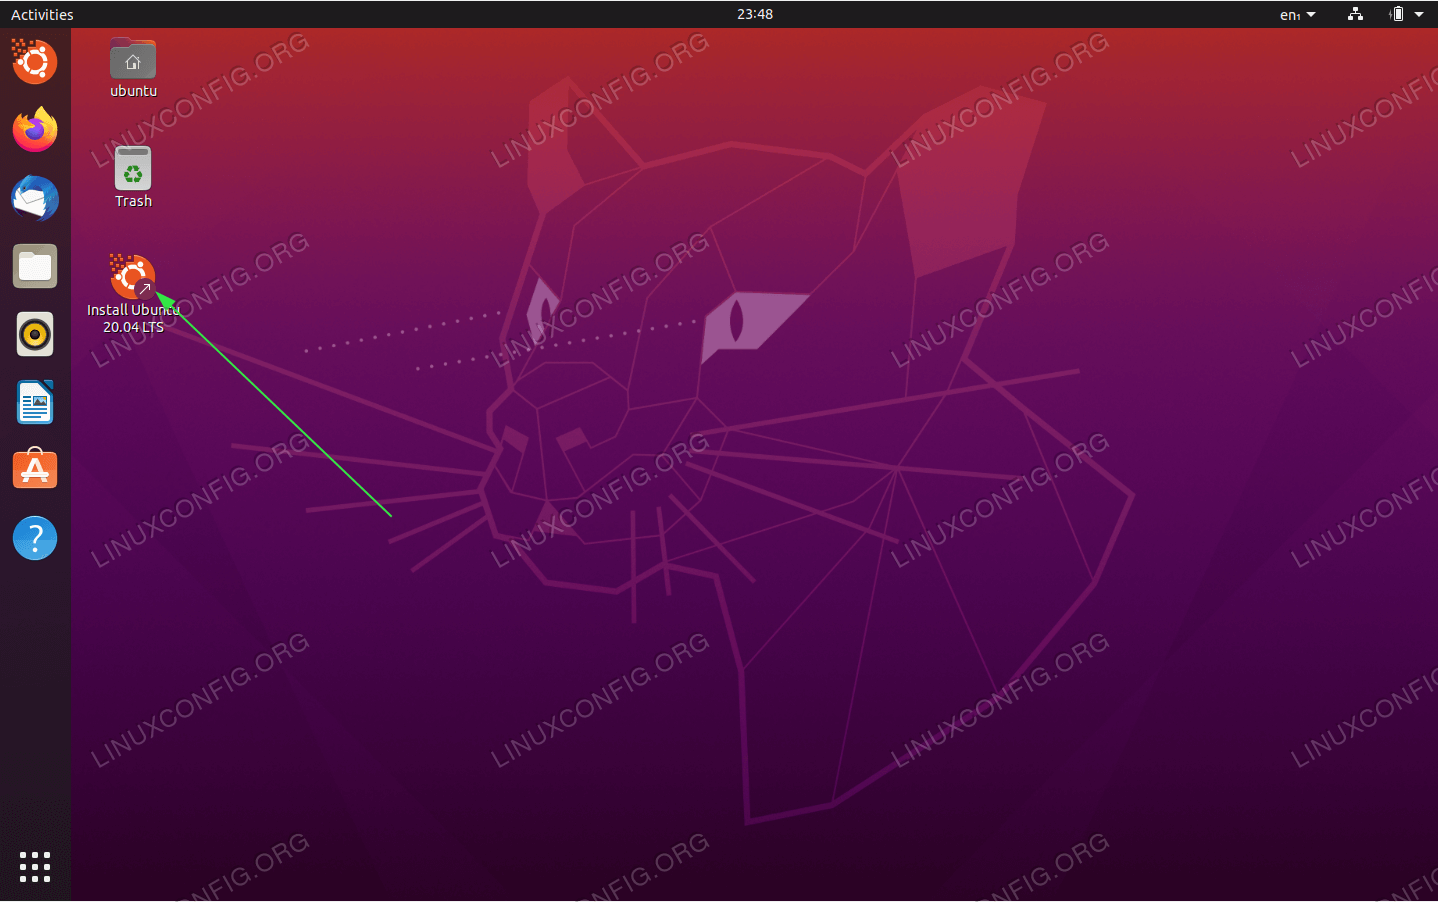 live ubuntu 20.04